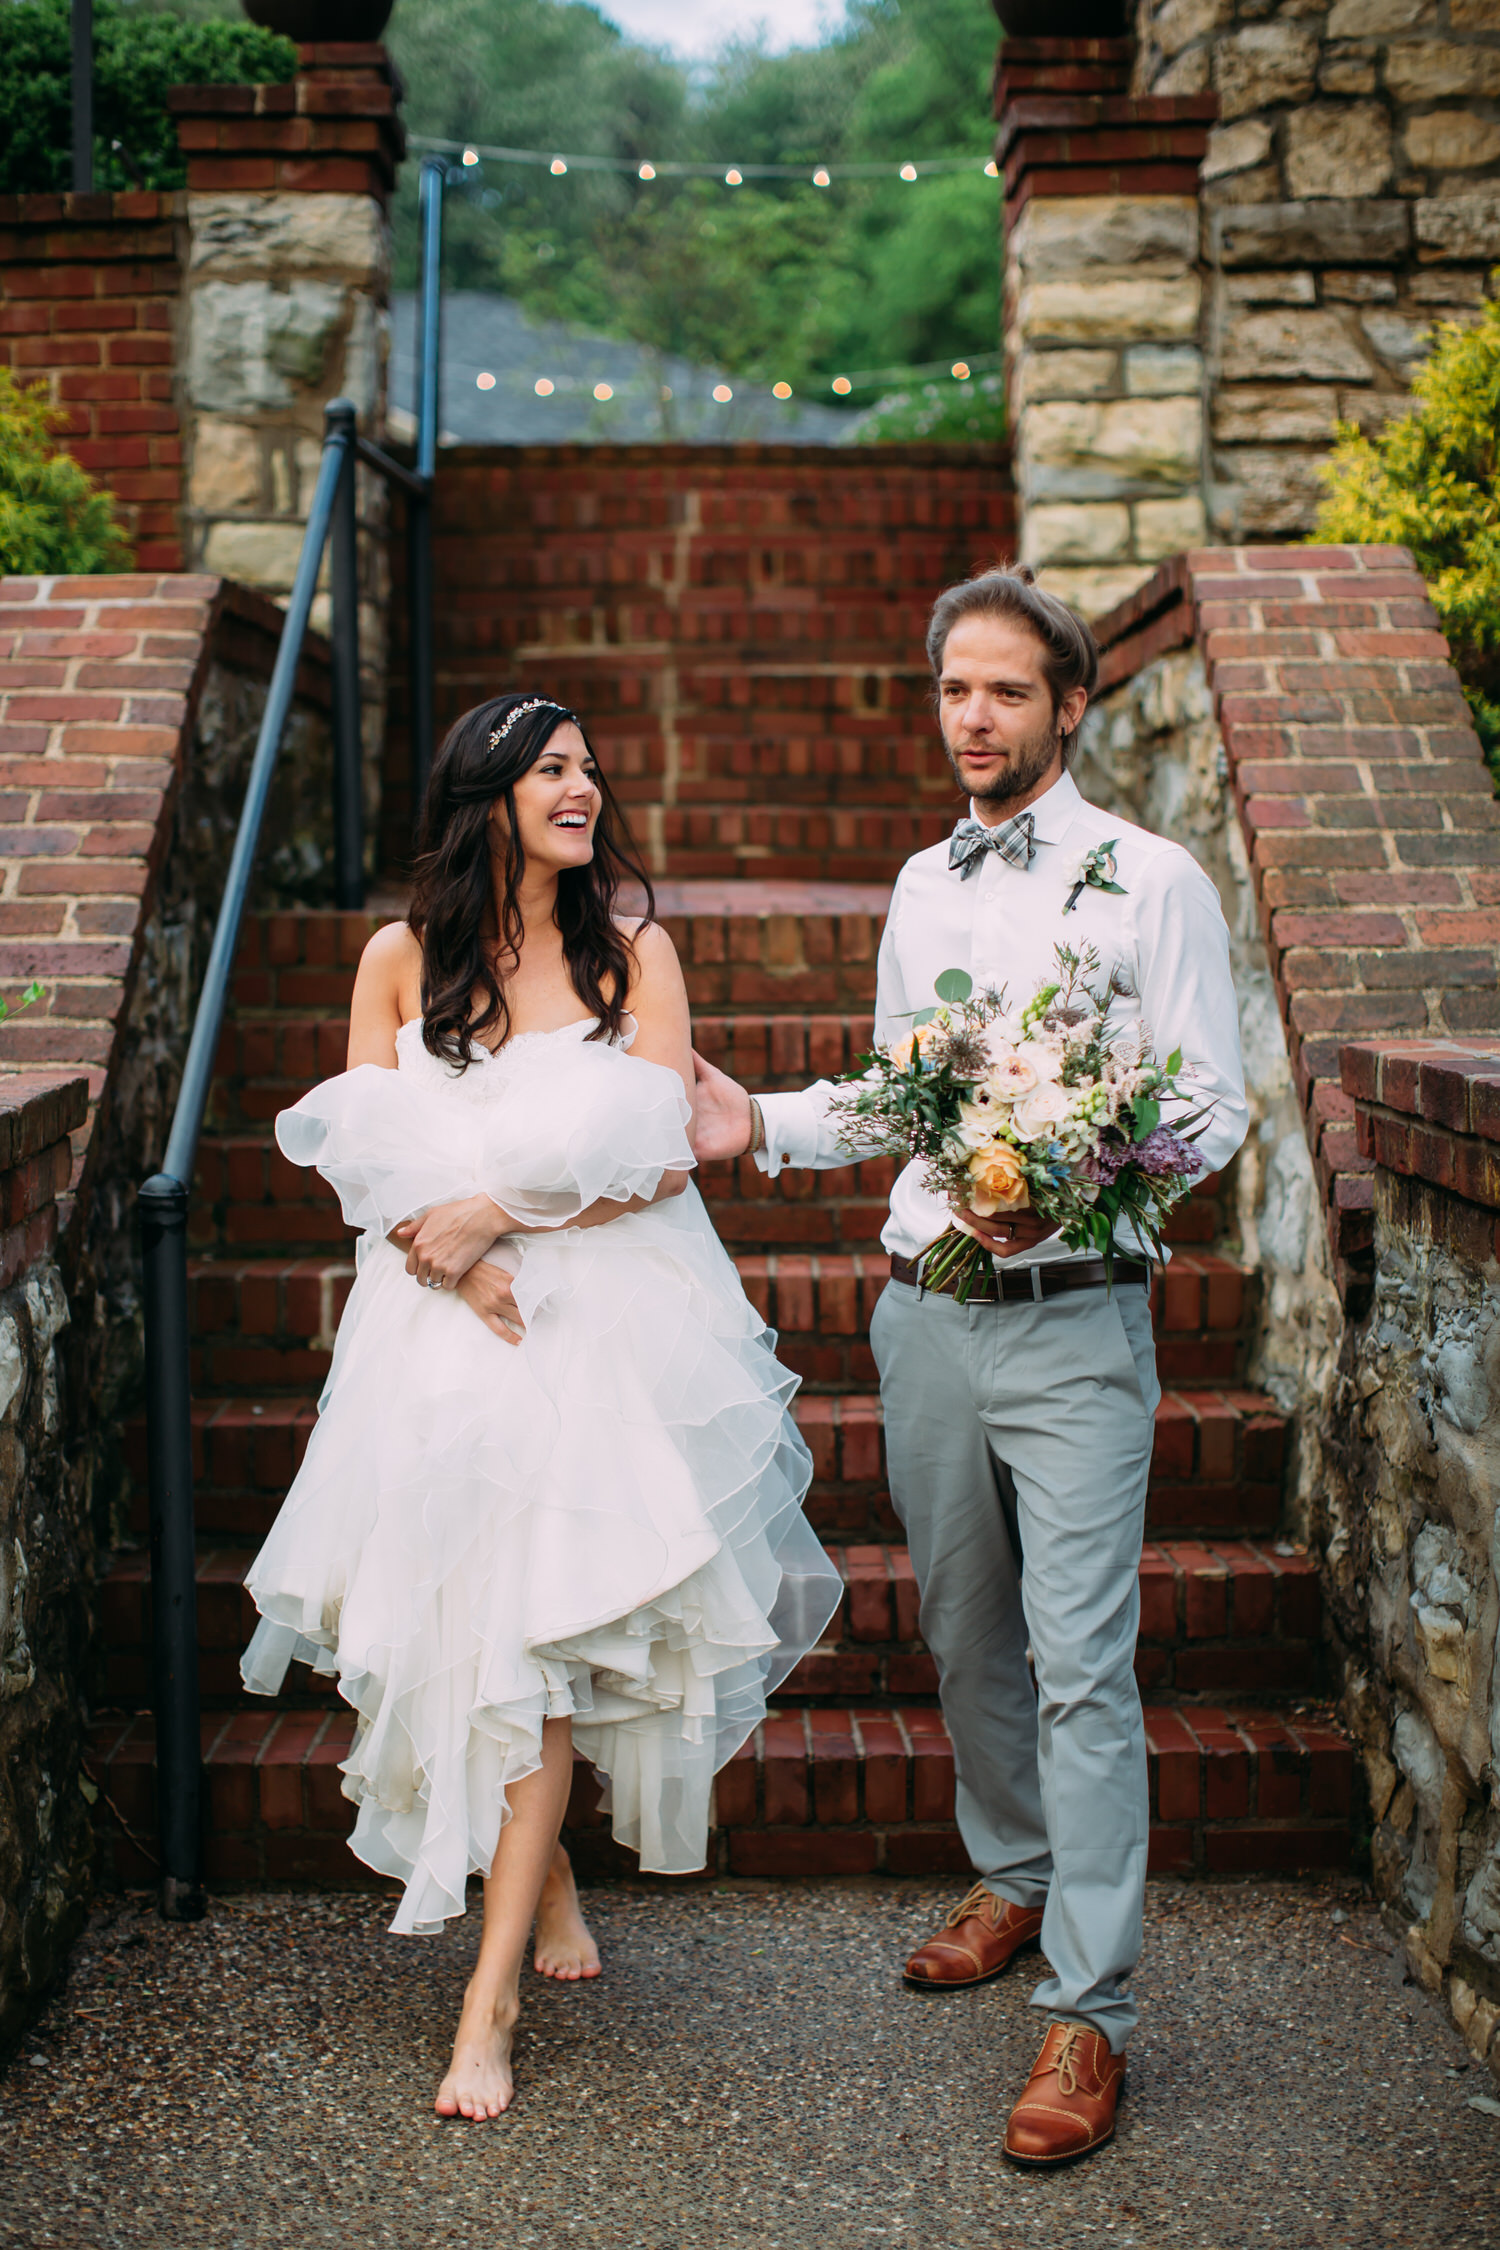 Bohemian wedding, st louis wedding photographer